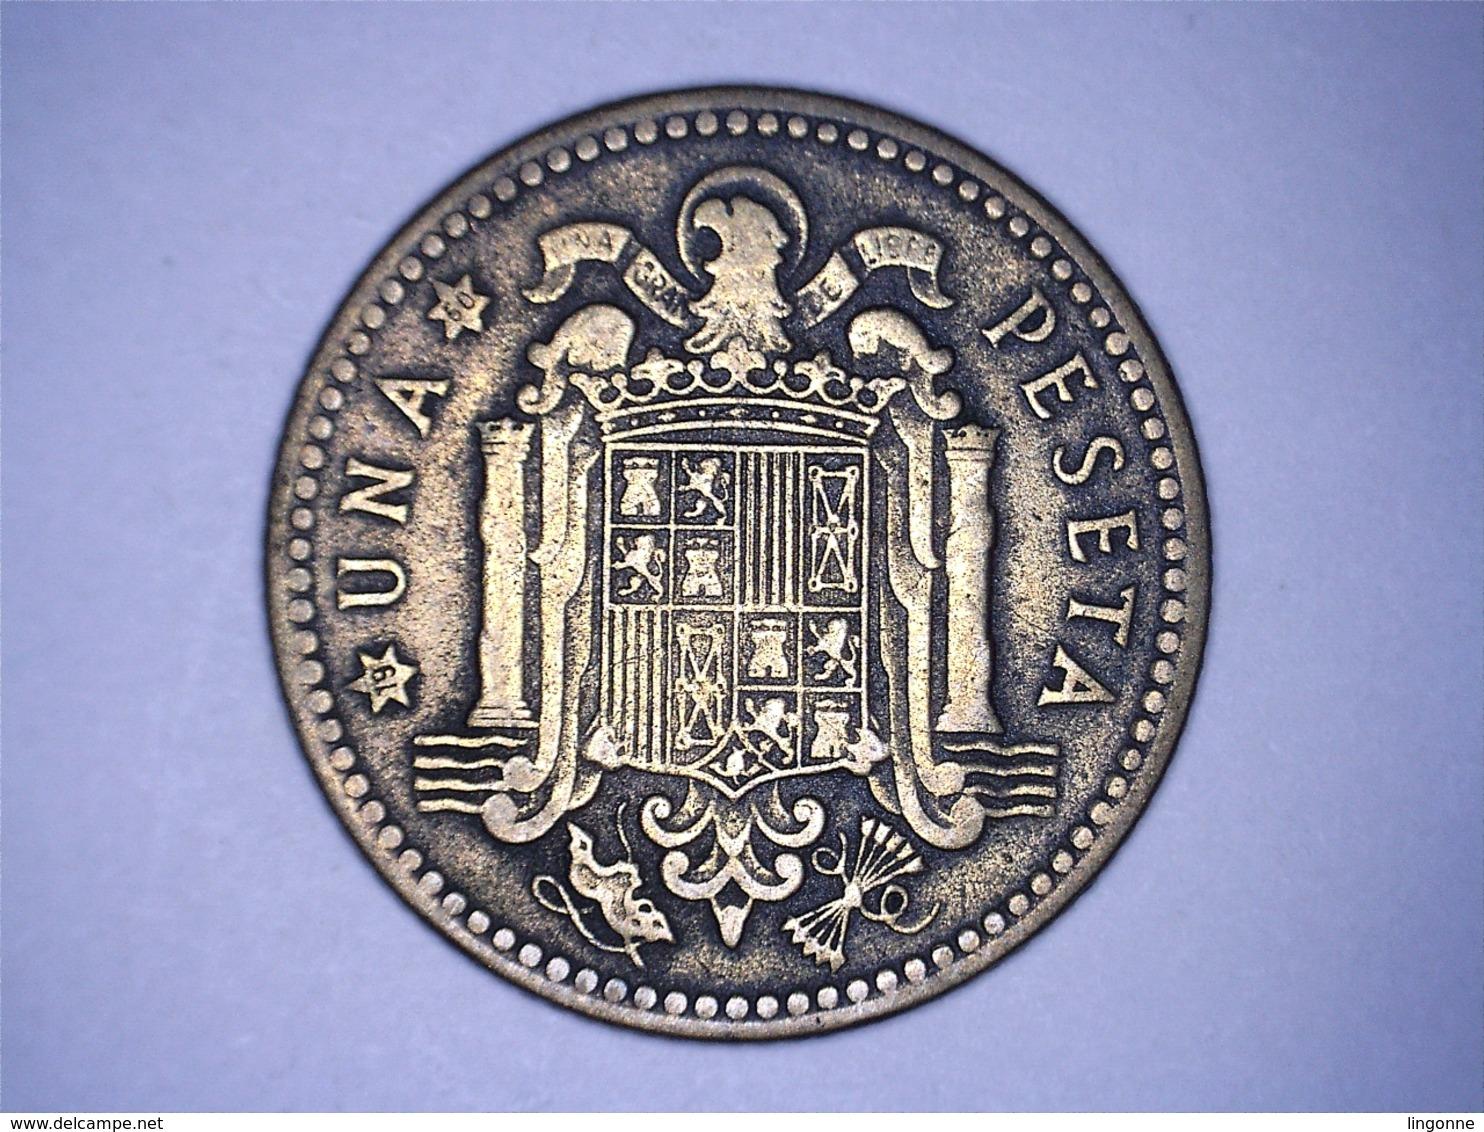 1947 - Espagne - Spain - UNA PESETA, ETOILE 50 - 1 Peseta